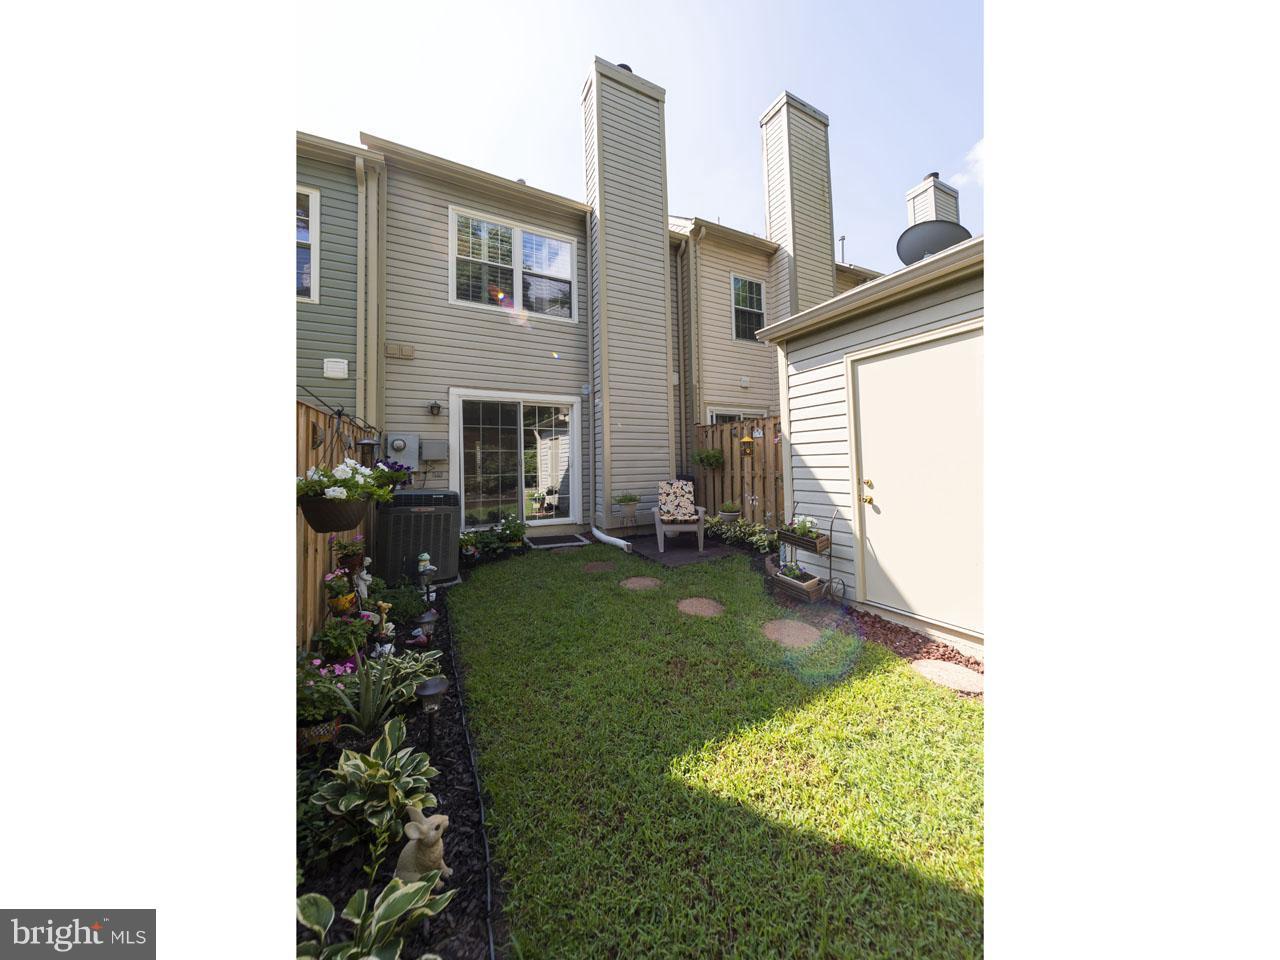 1002640508-300537943294-2021-07-22-05-00-37     Pinecrest   Alexandria Delaware Real Estate For Sale   MLS# 1002640508  - Best of Northern Virginia